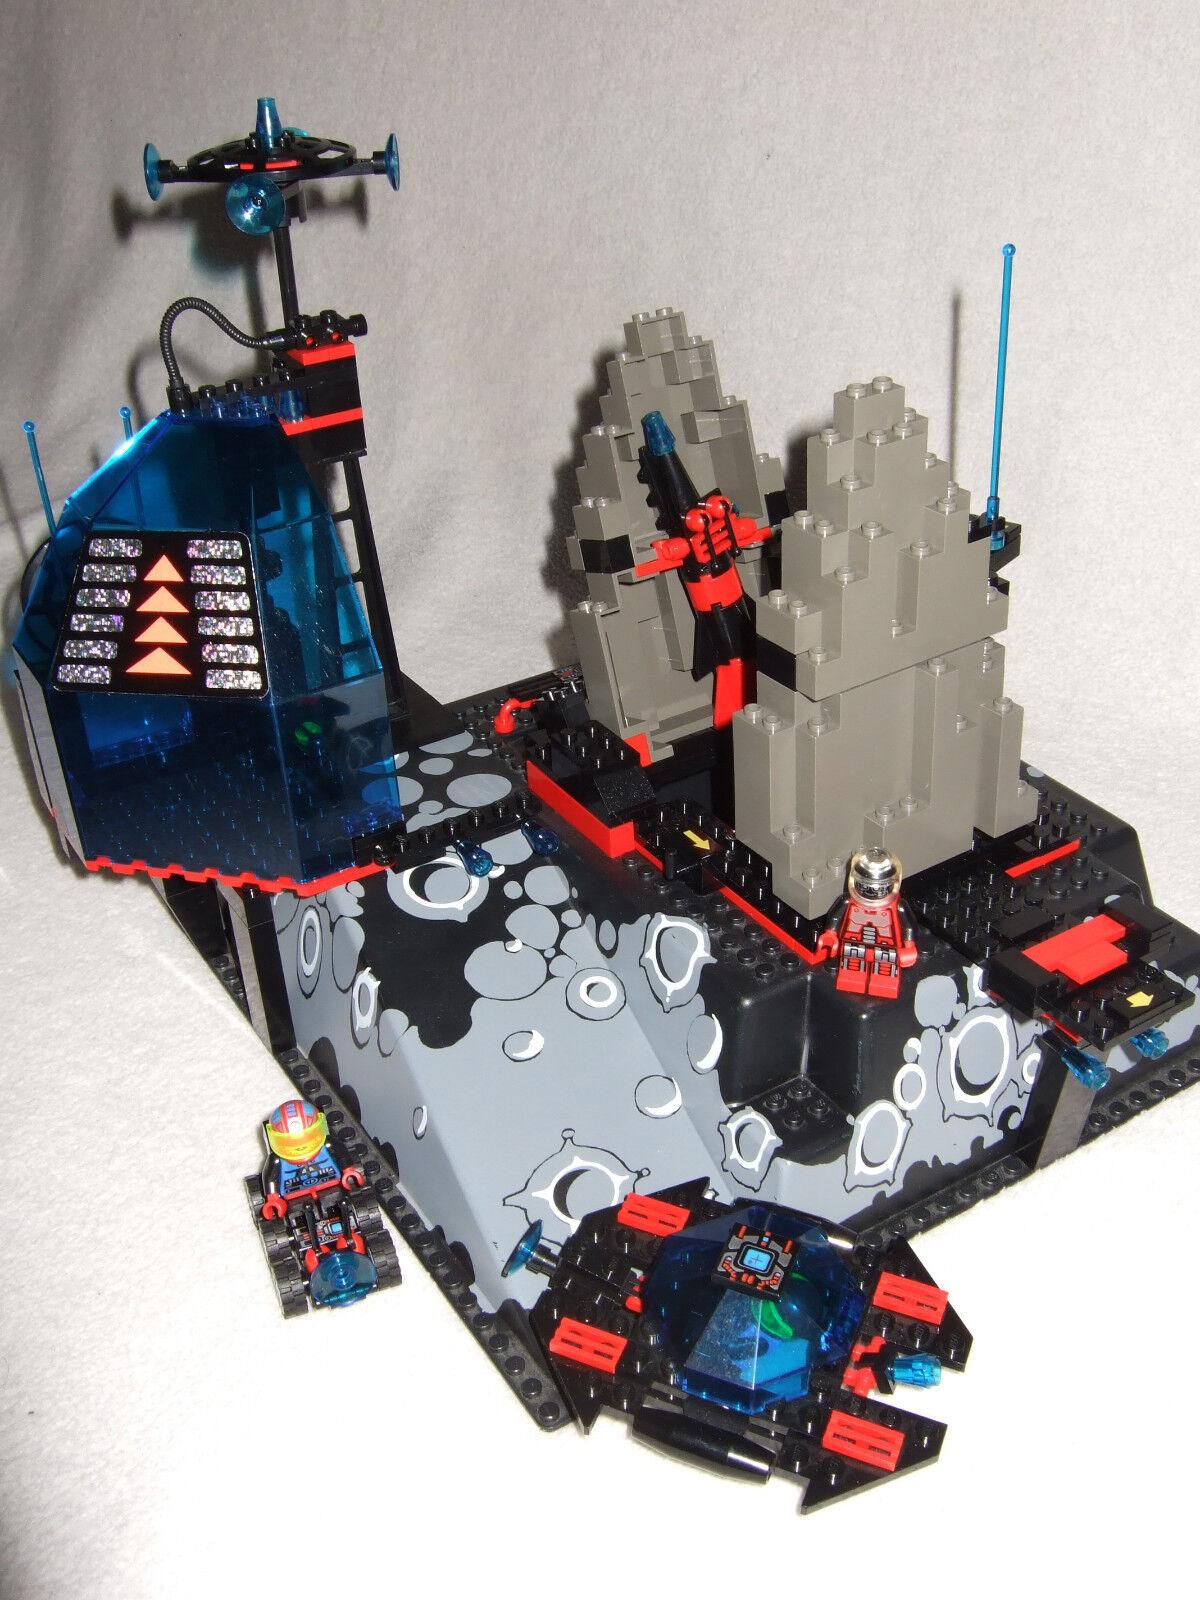 LEGO System Lunar 6959 Spyrius Berg der Mutanten Lunar System Launch Site OBA 1b769e